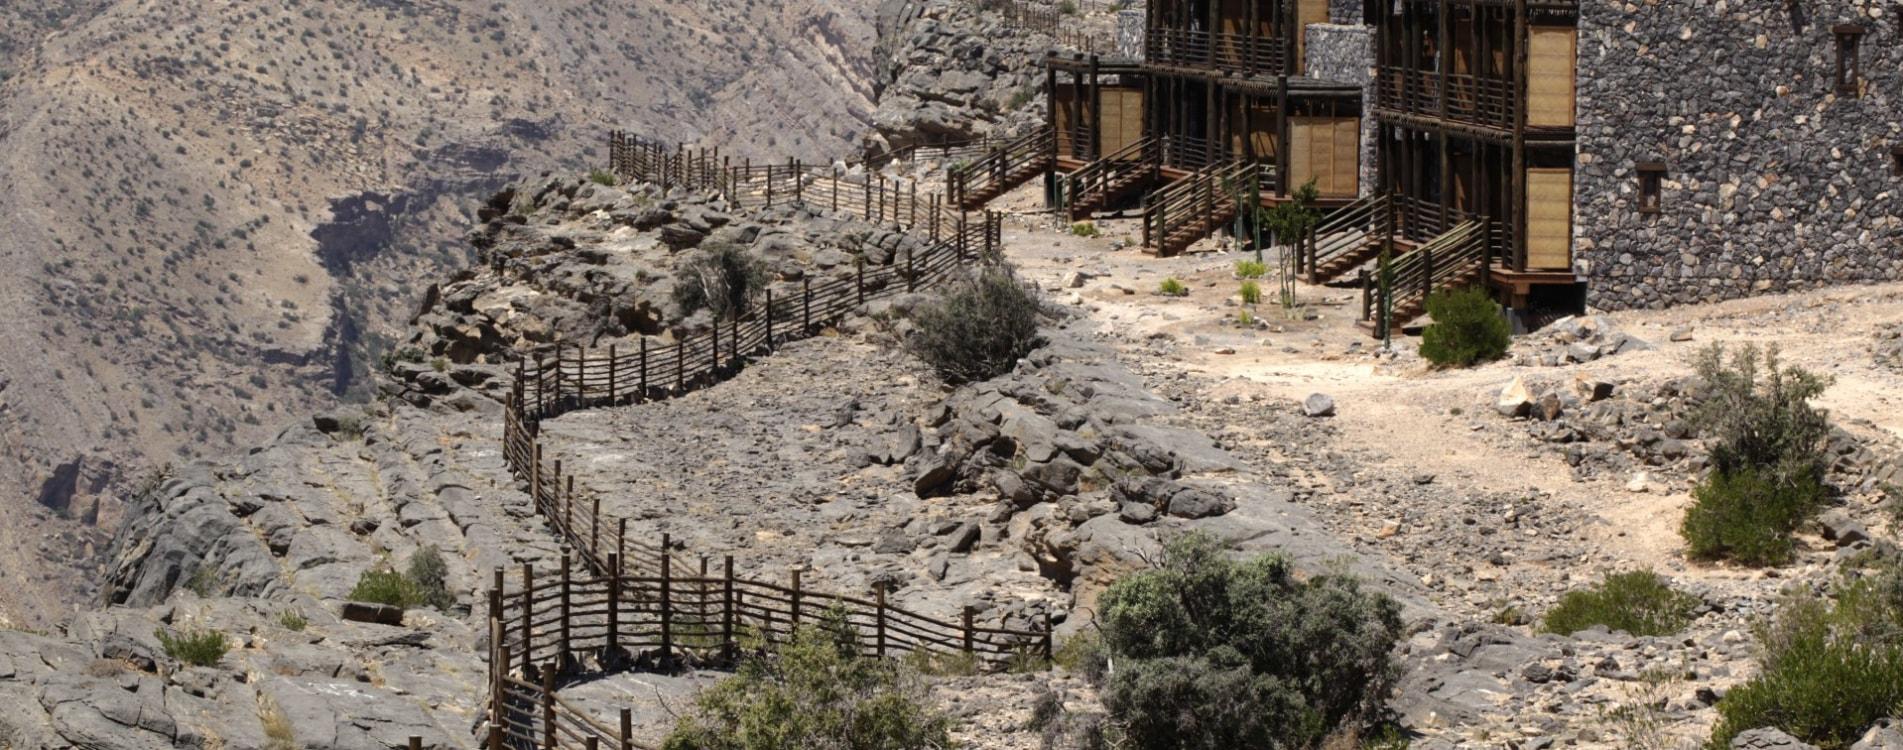 Alila-Jabal-Akhdar-Exterior-Klippe-Oman.jpg